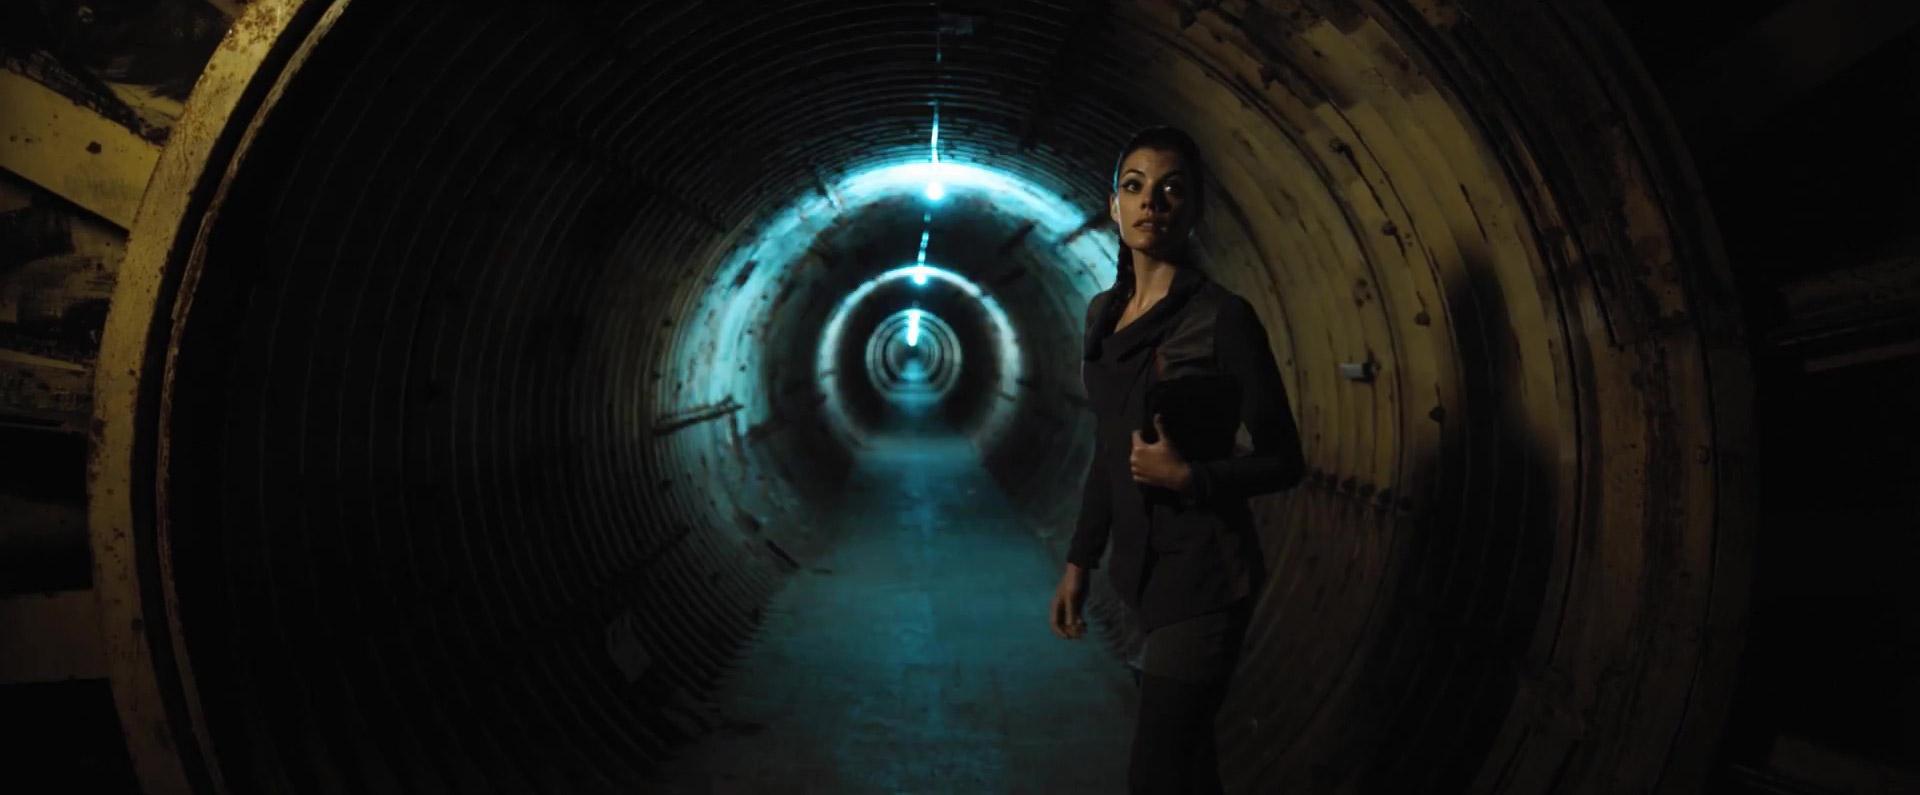 half-life-uk-scifi-movie-trailer